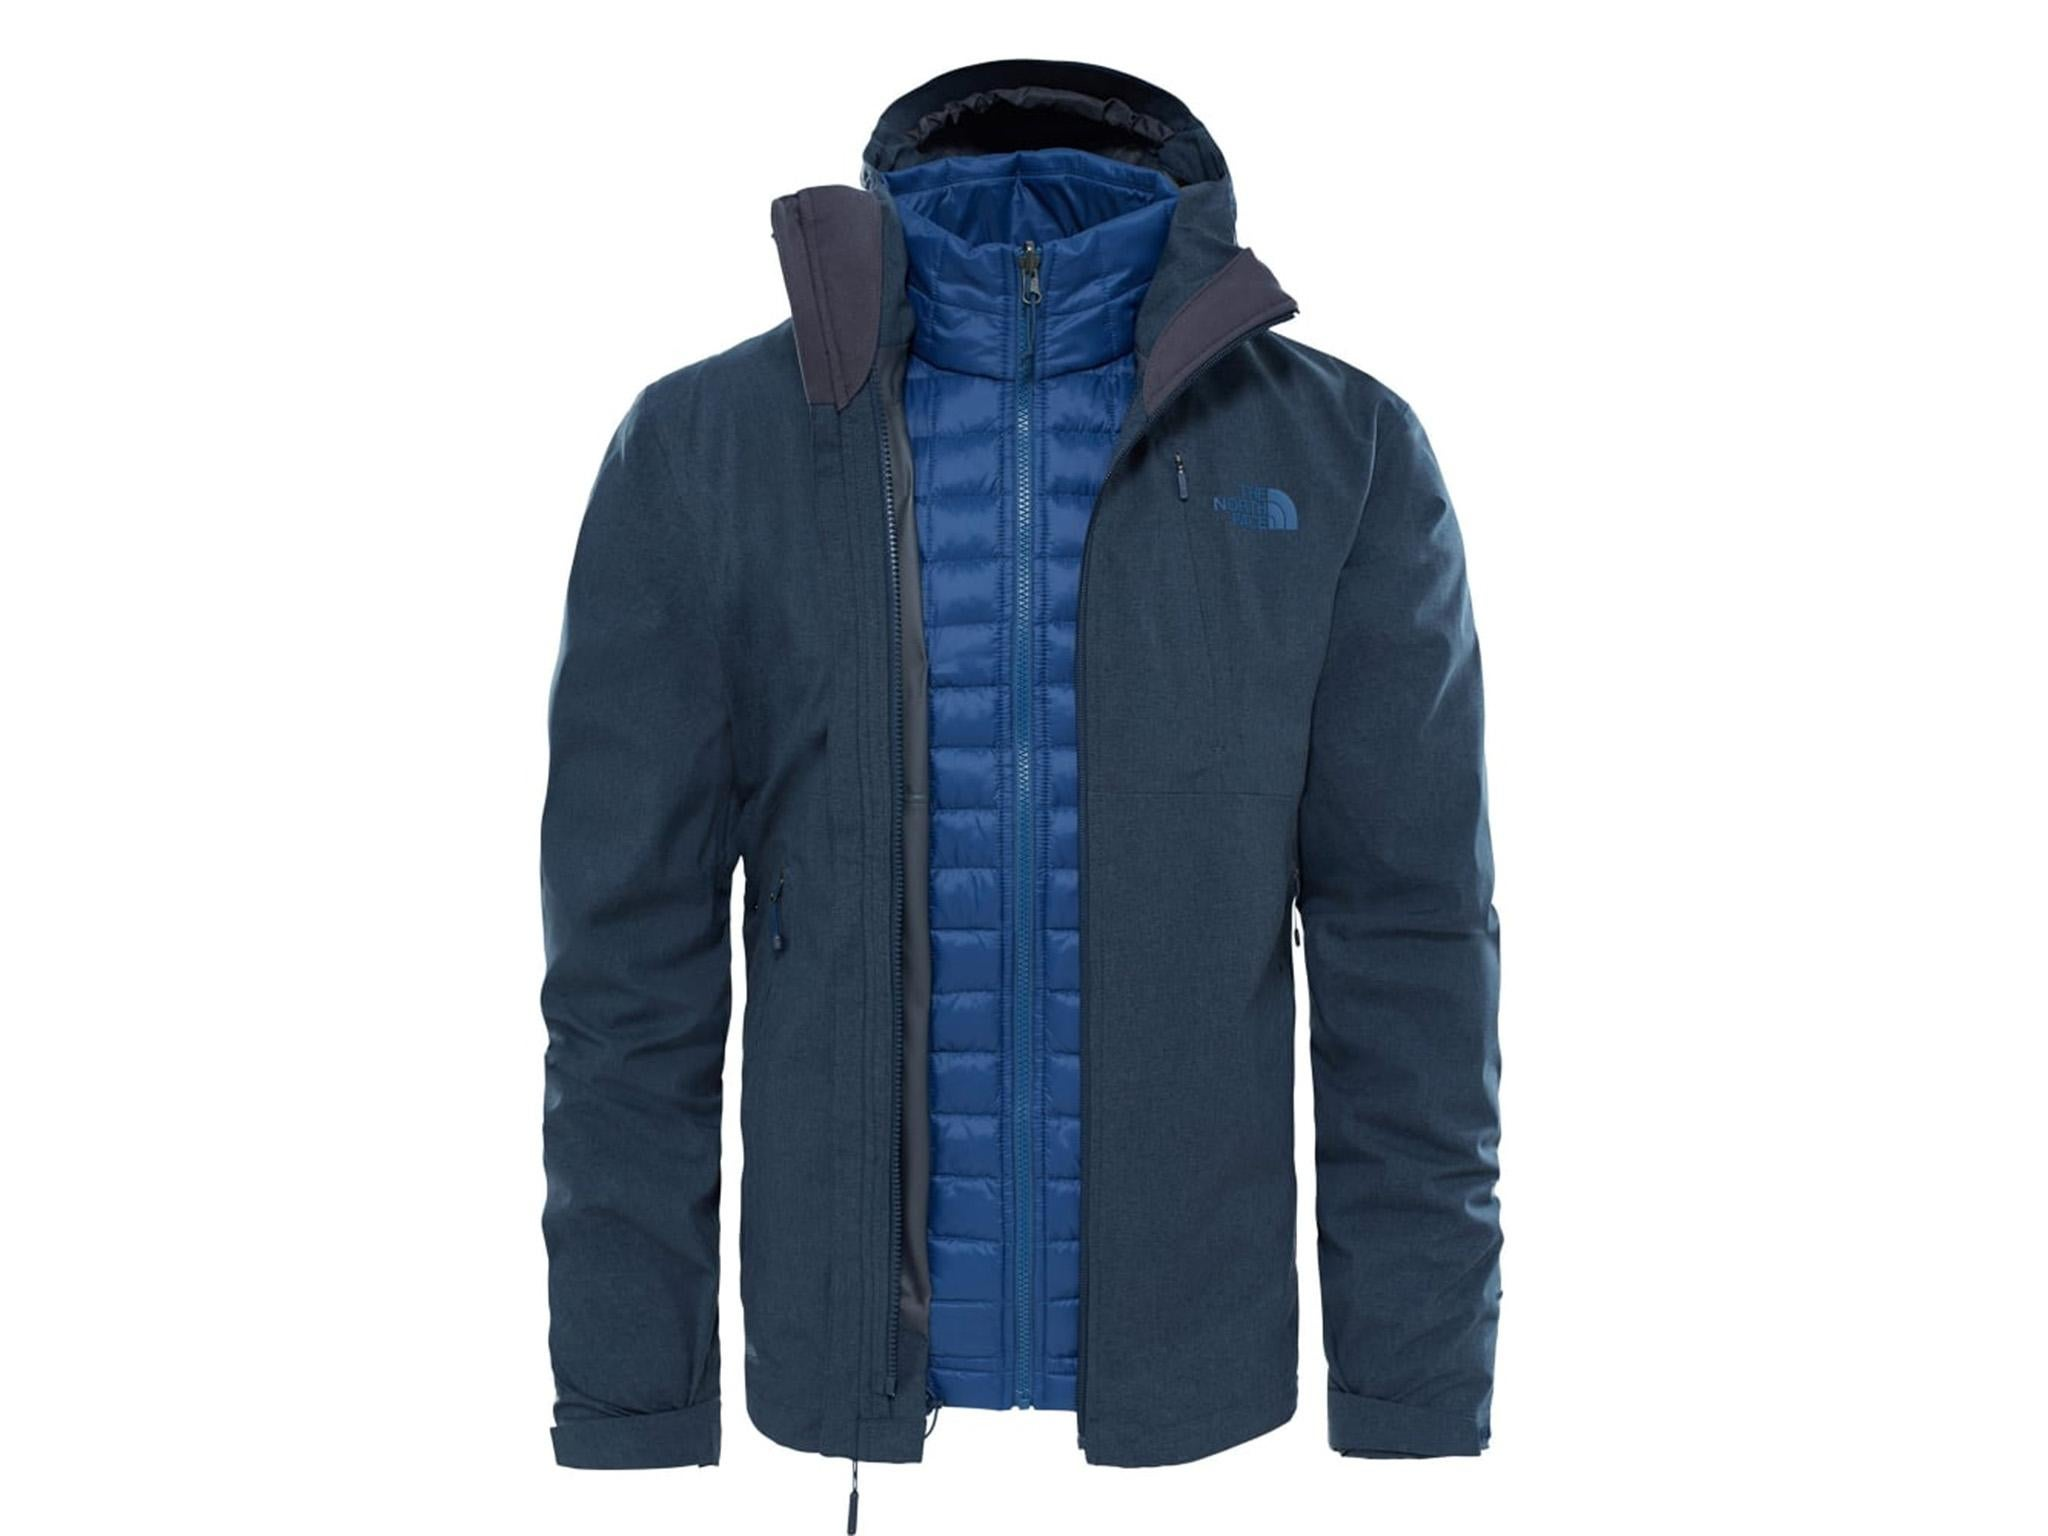 2f05d183895fd 6 best men's walking jackets | The Independent